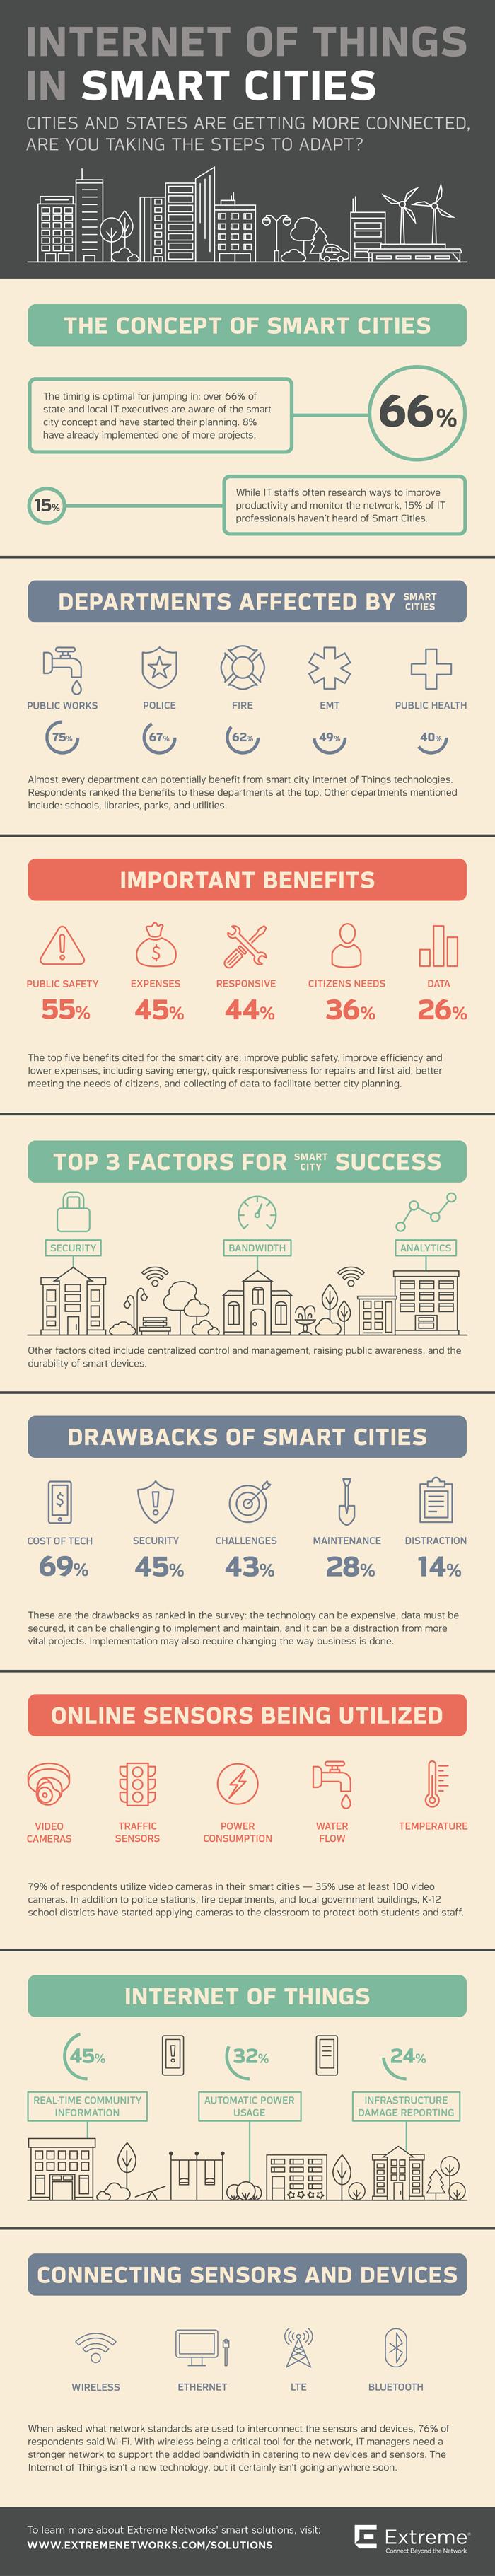 11341-Smart-City-Infographic_v2.png